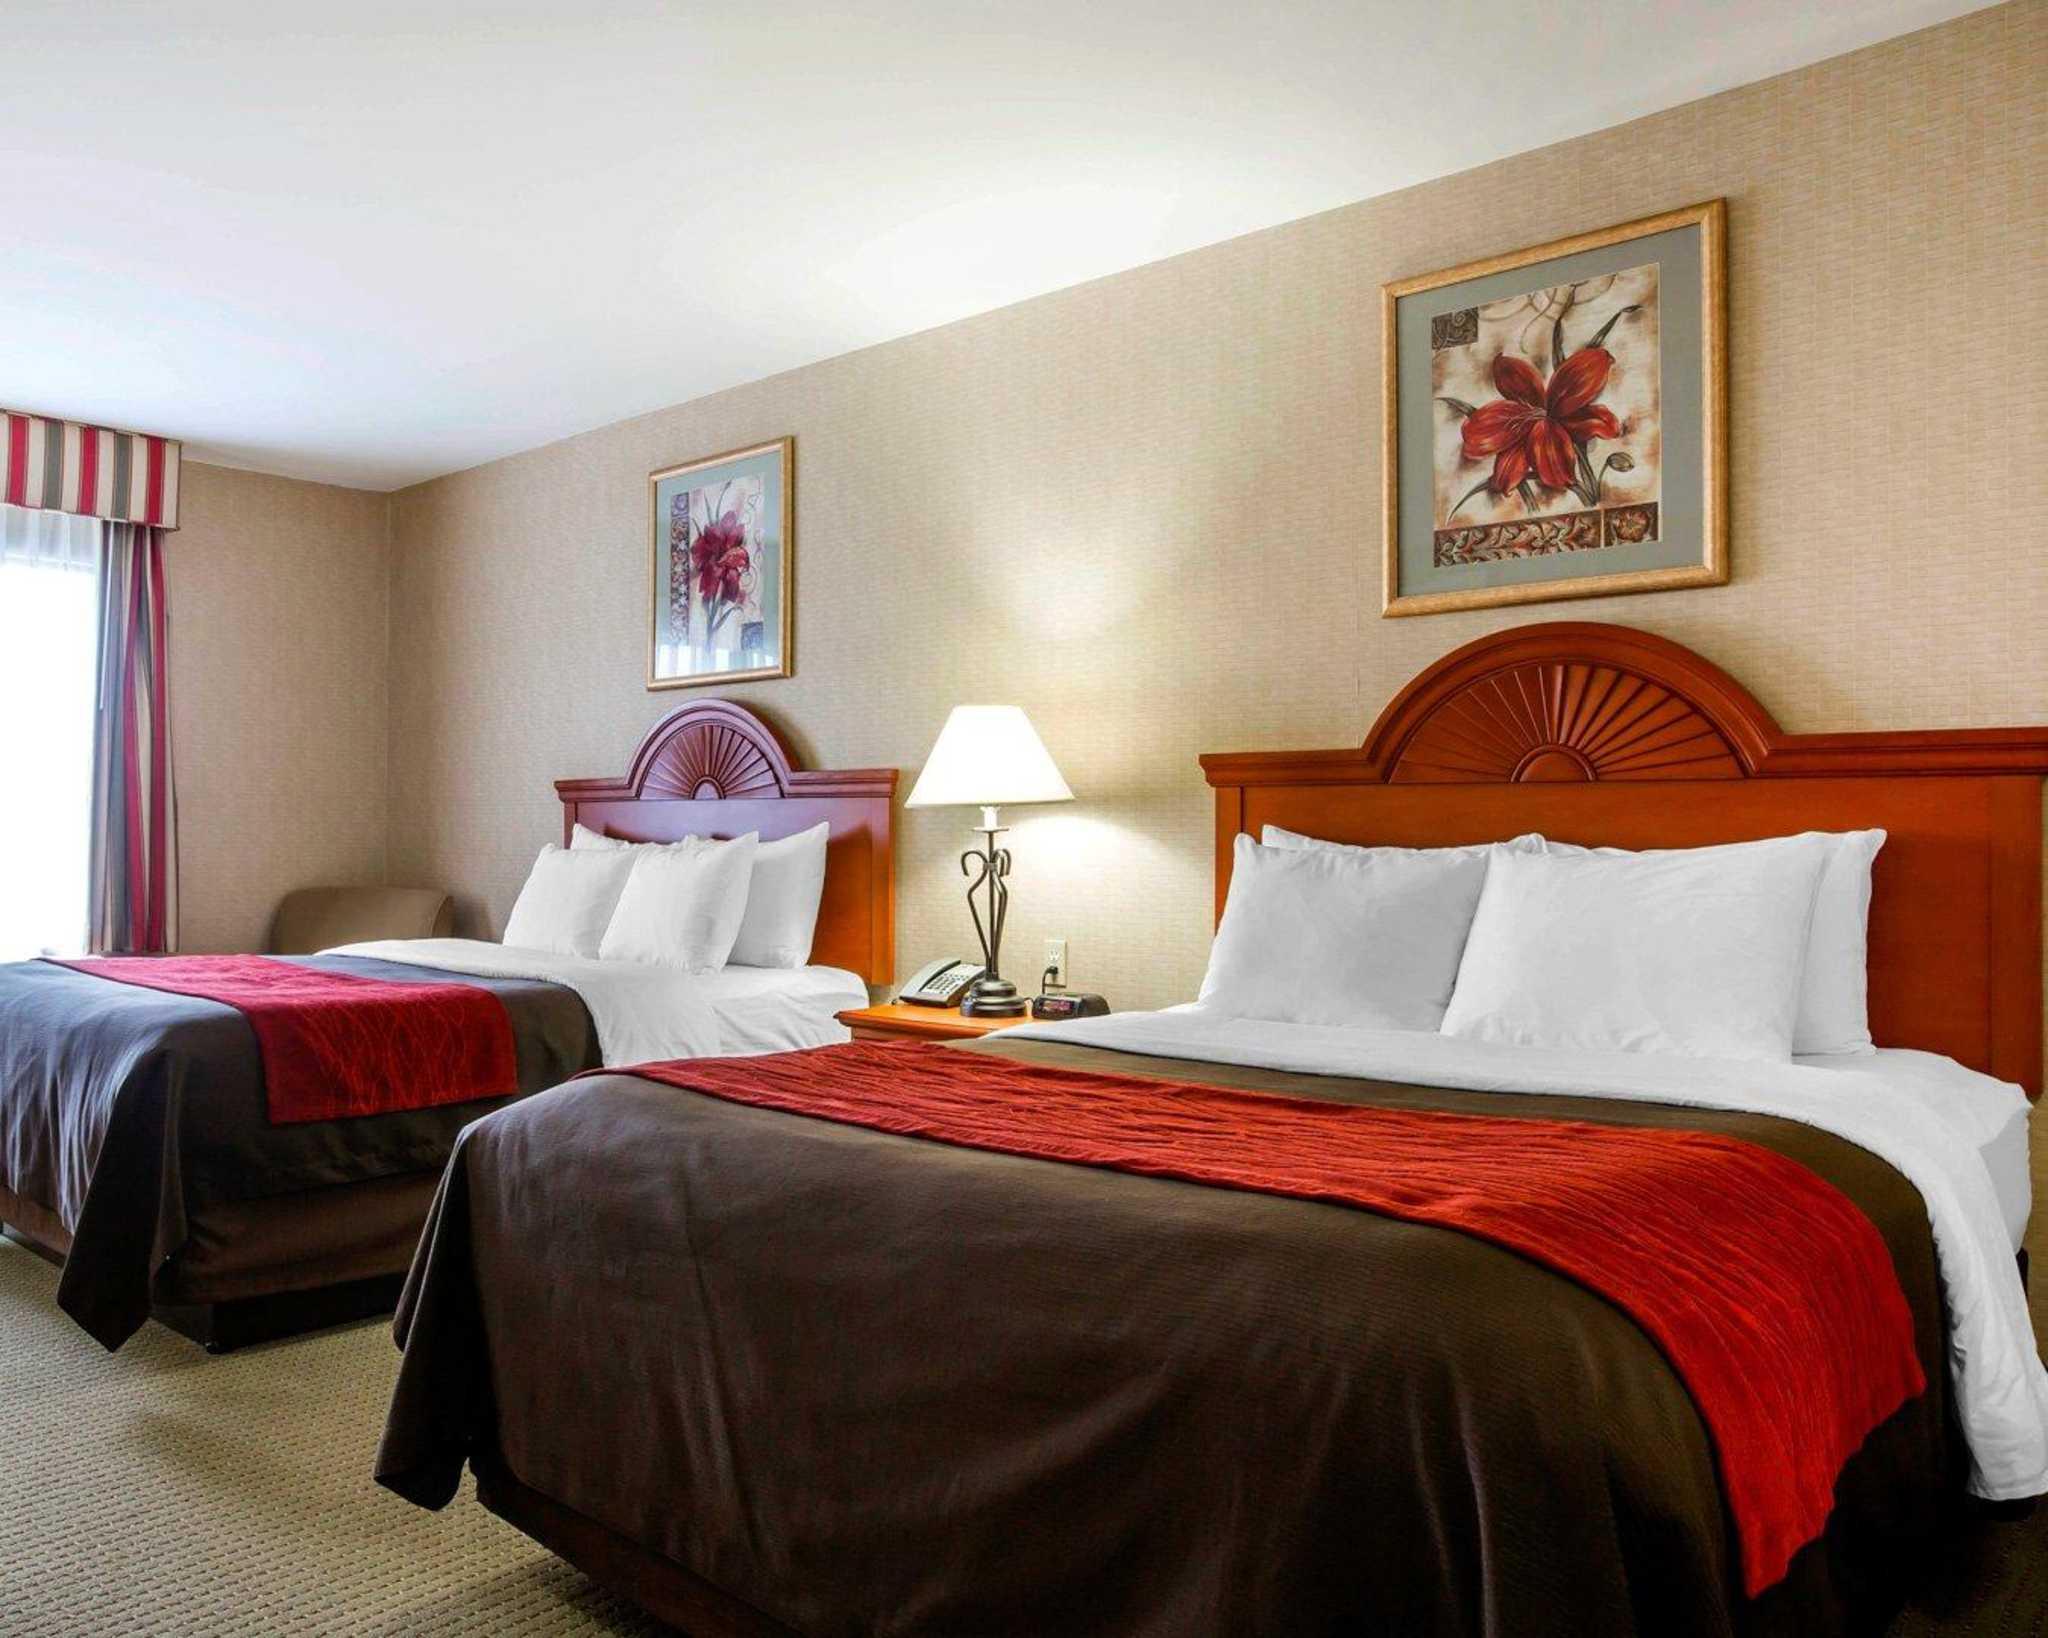 Comfort Inn & Suites adj to Akwesasne Mohawk Casino image 40